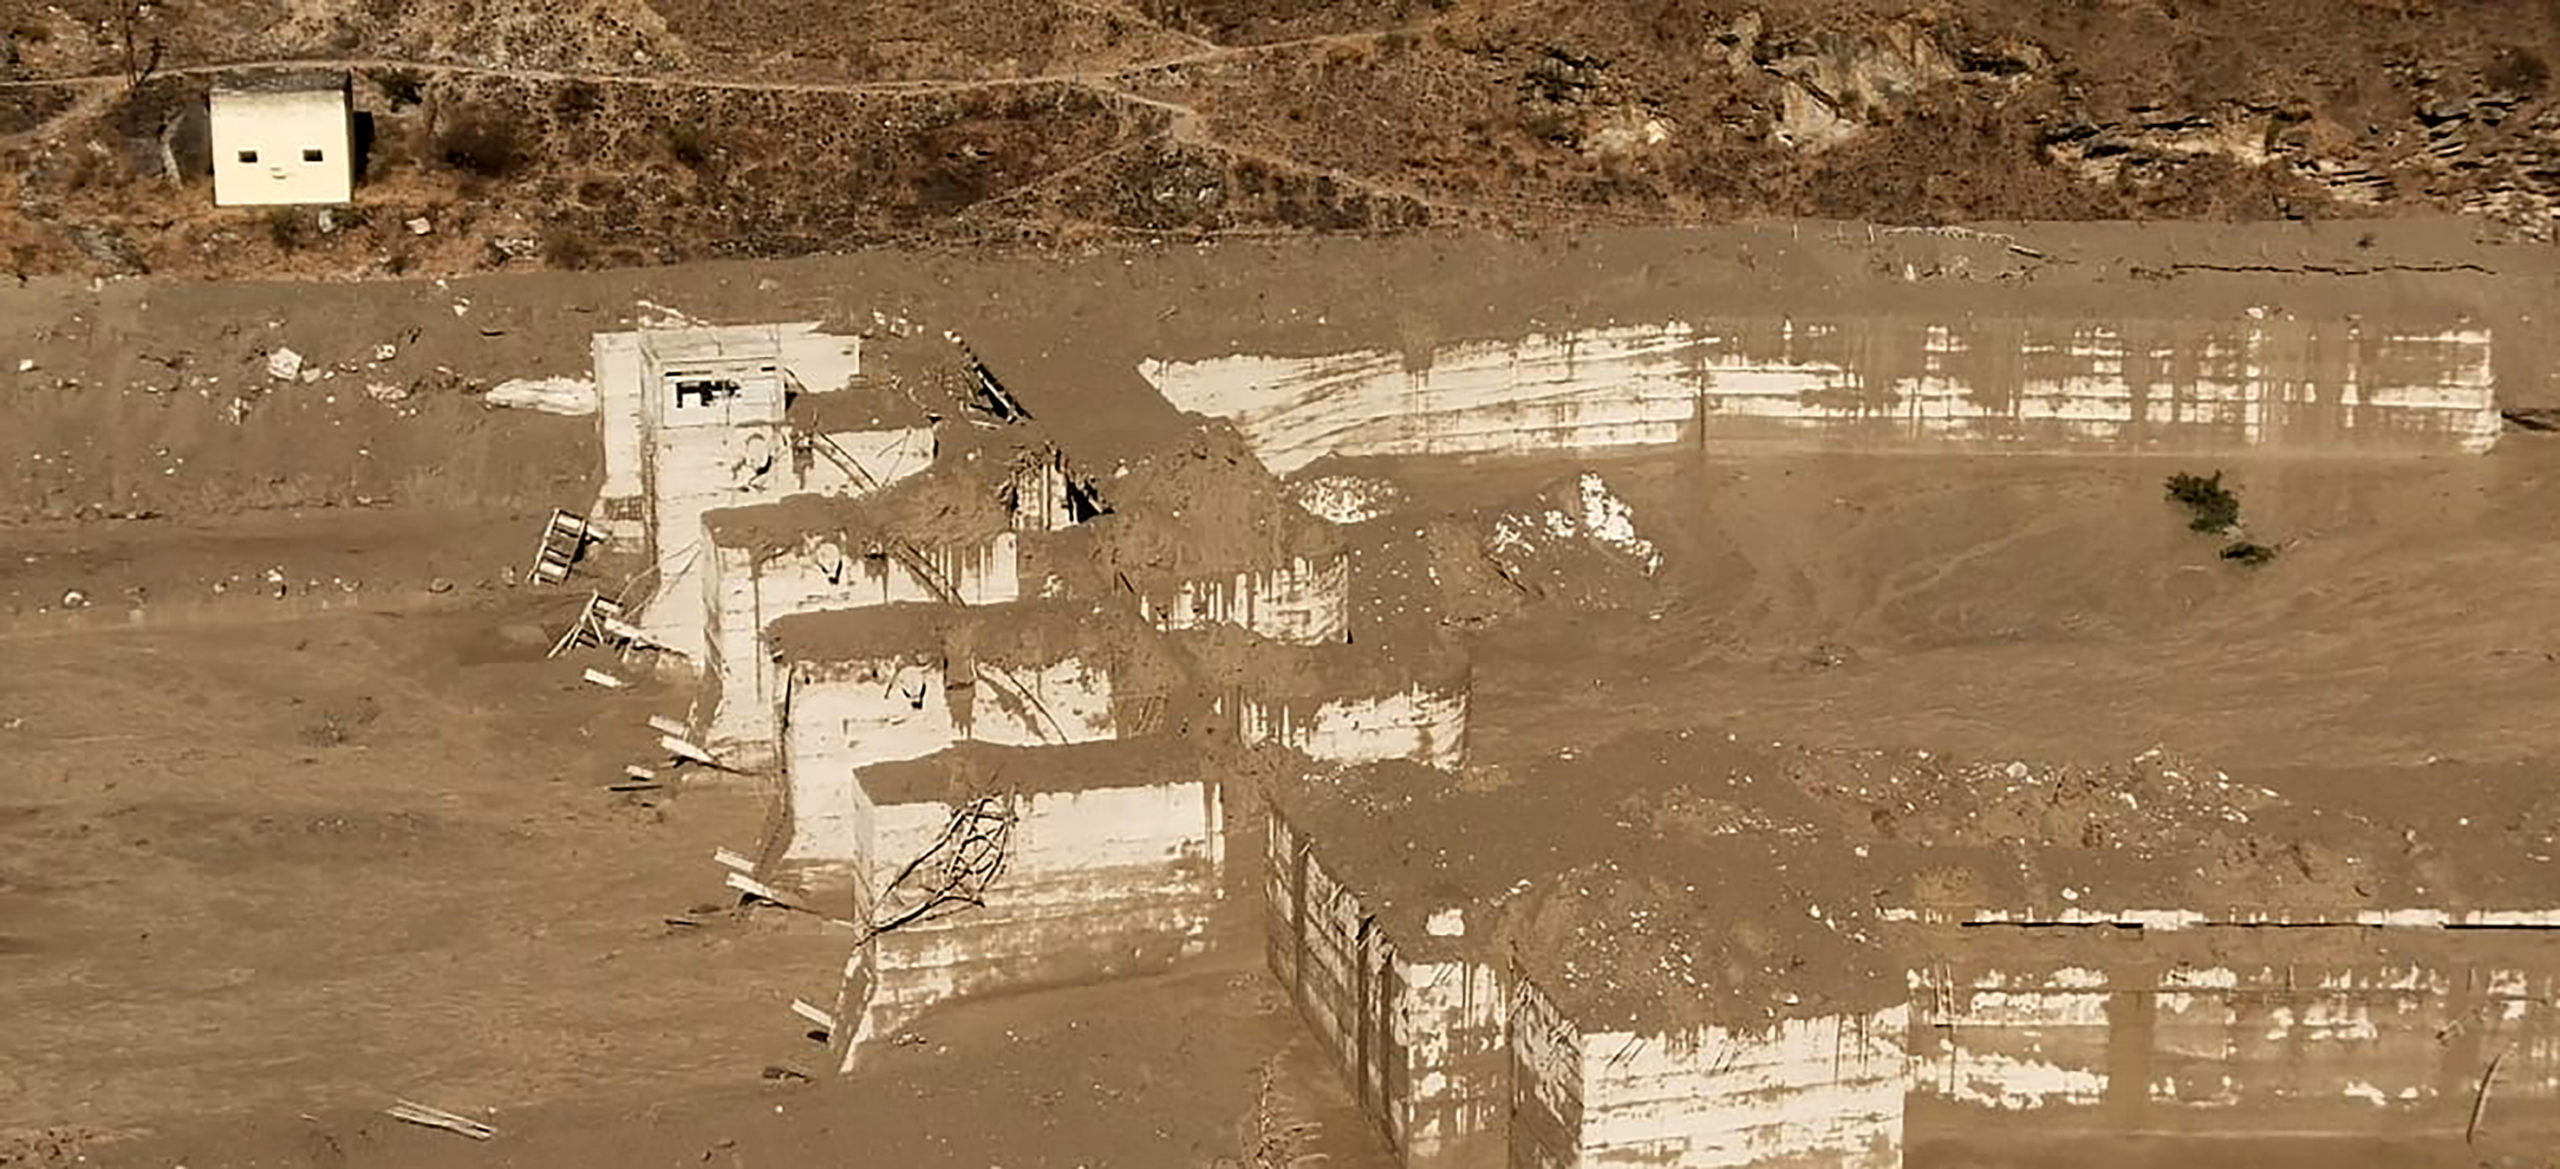 Glacier Breaks in India's North; Flood Kills 9, 140 Missing